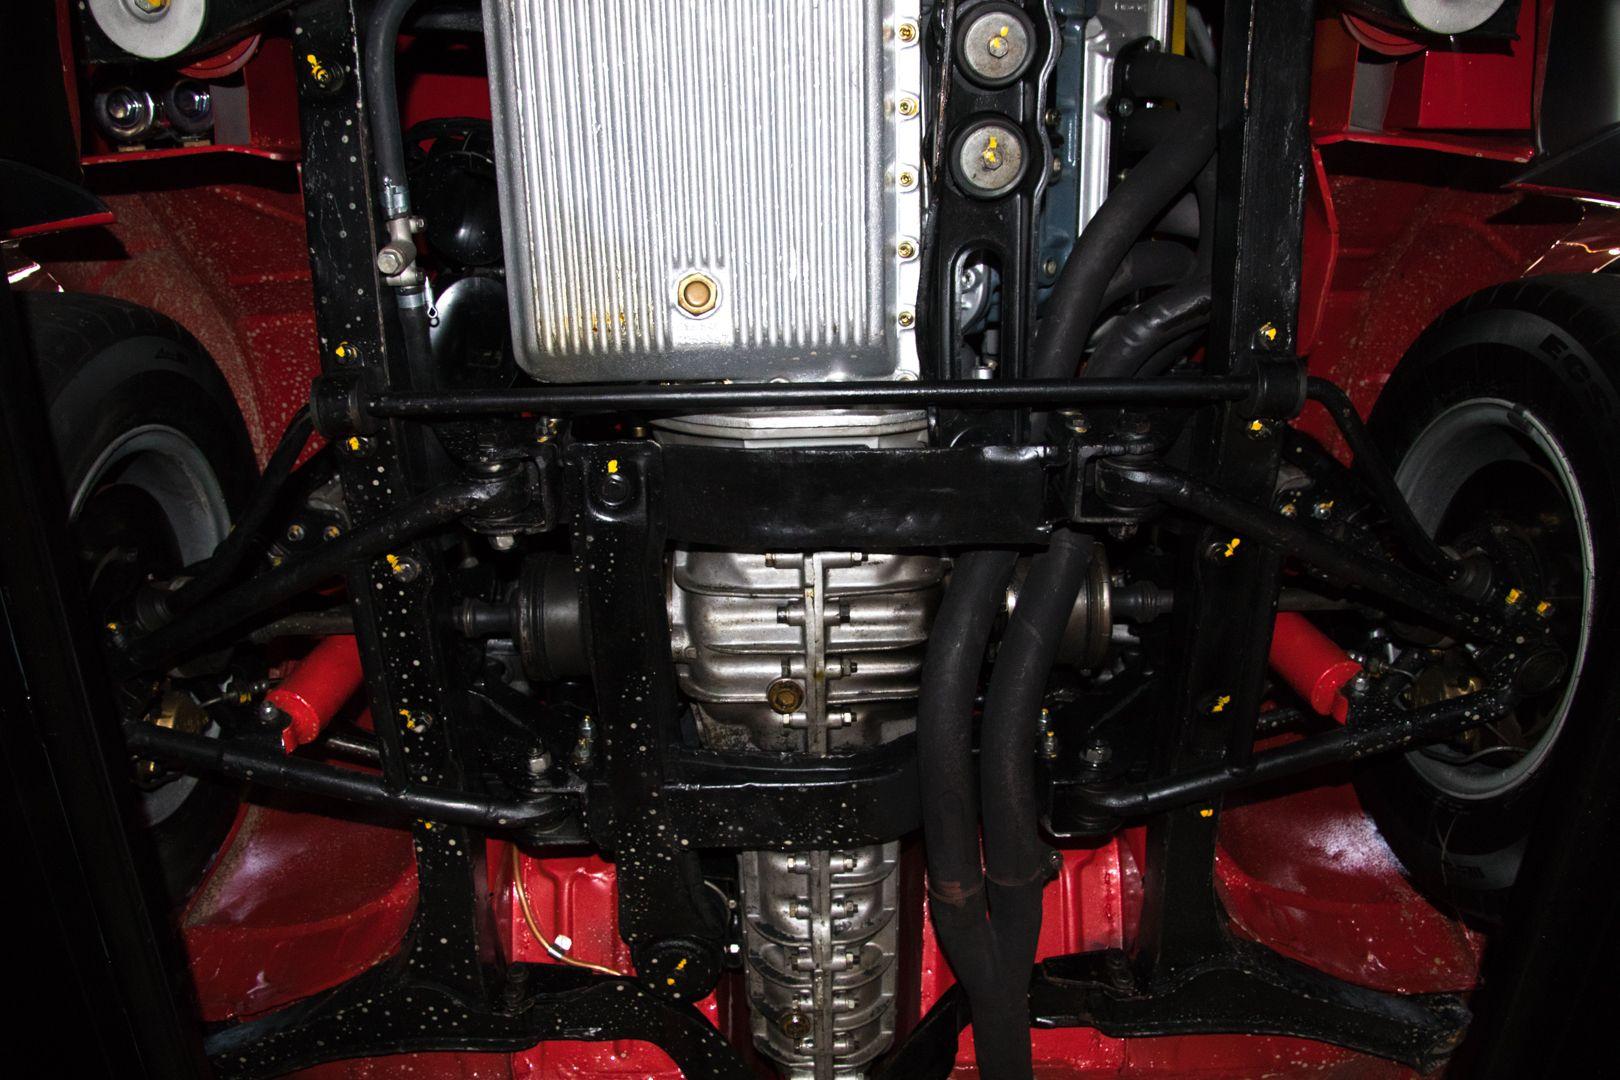 1970 Lancia Fulvia HF 1.6 - Gruppo 4 18799